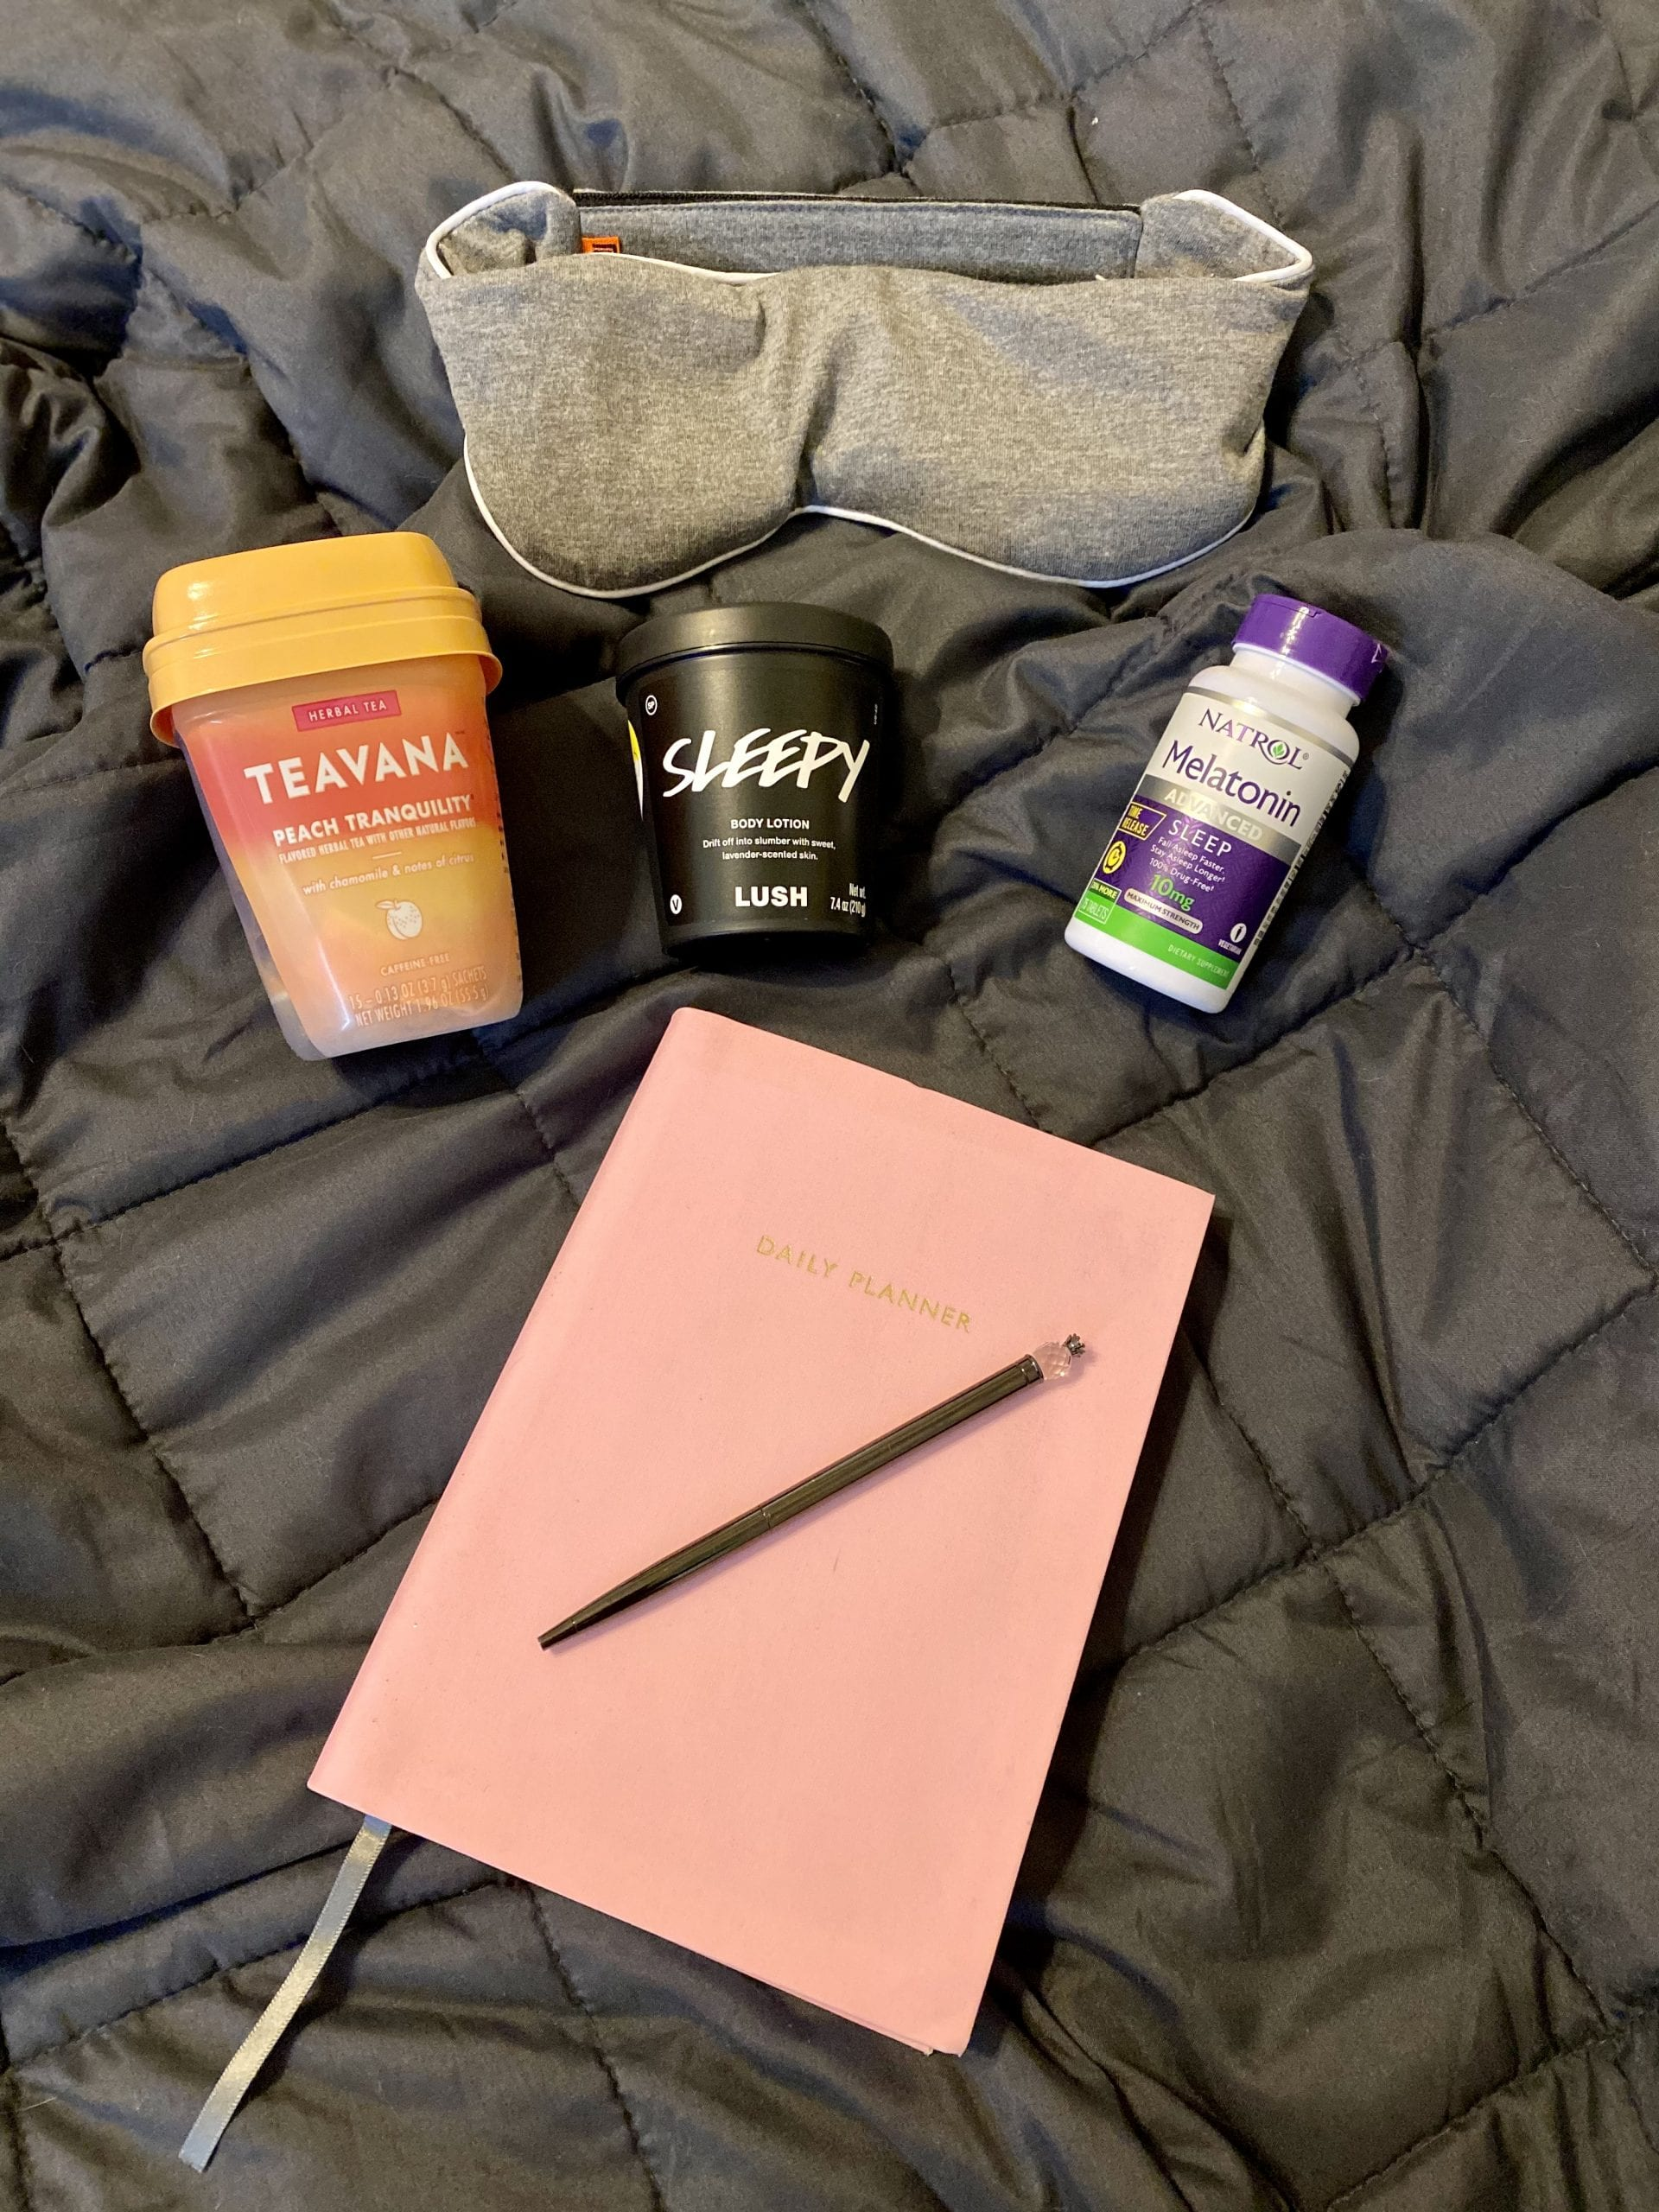 sleep aids such as melatonin, tea and weighted blanket